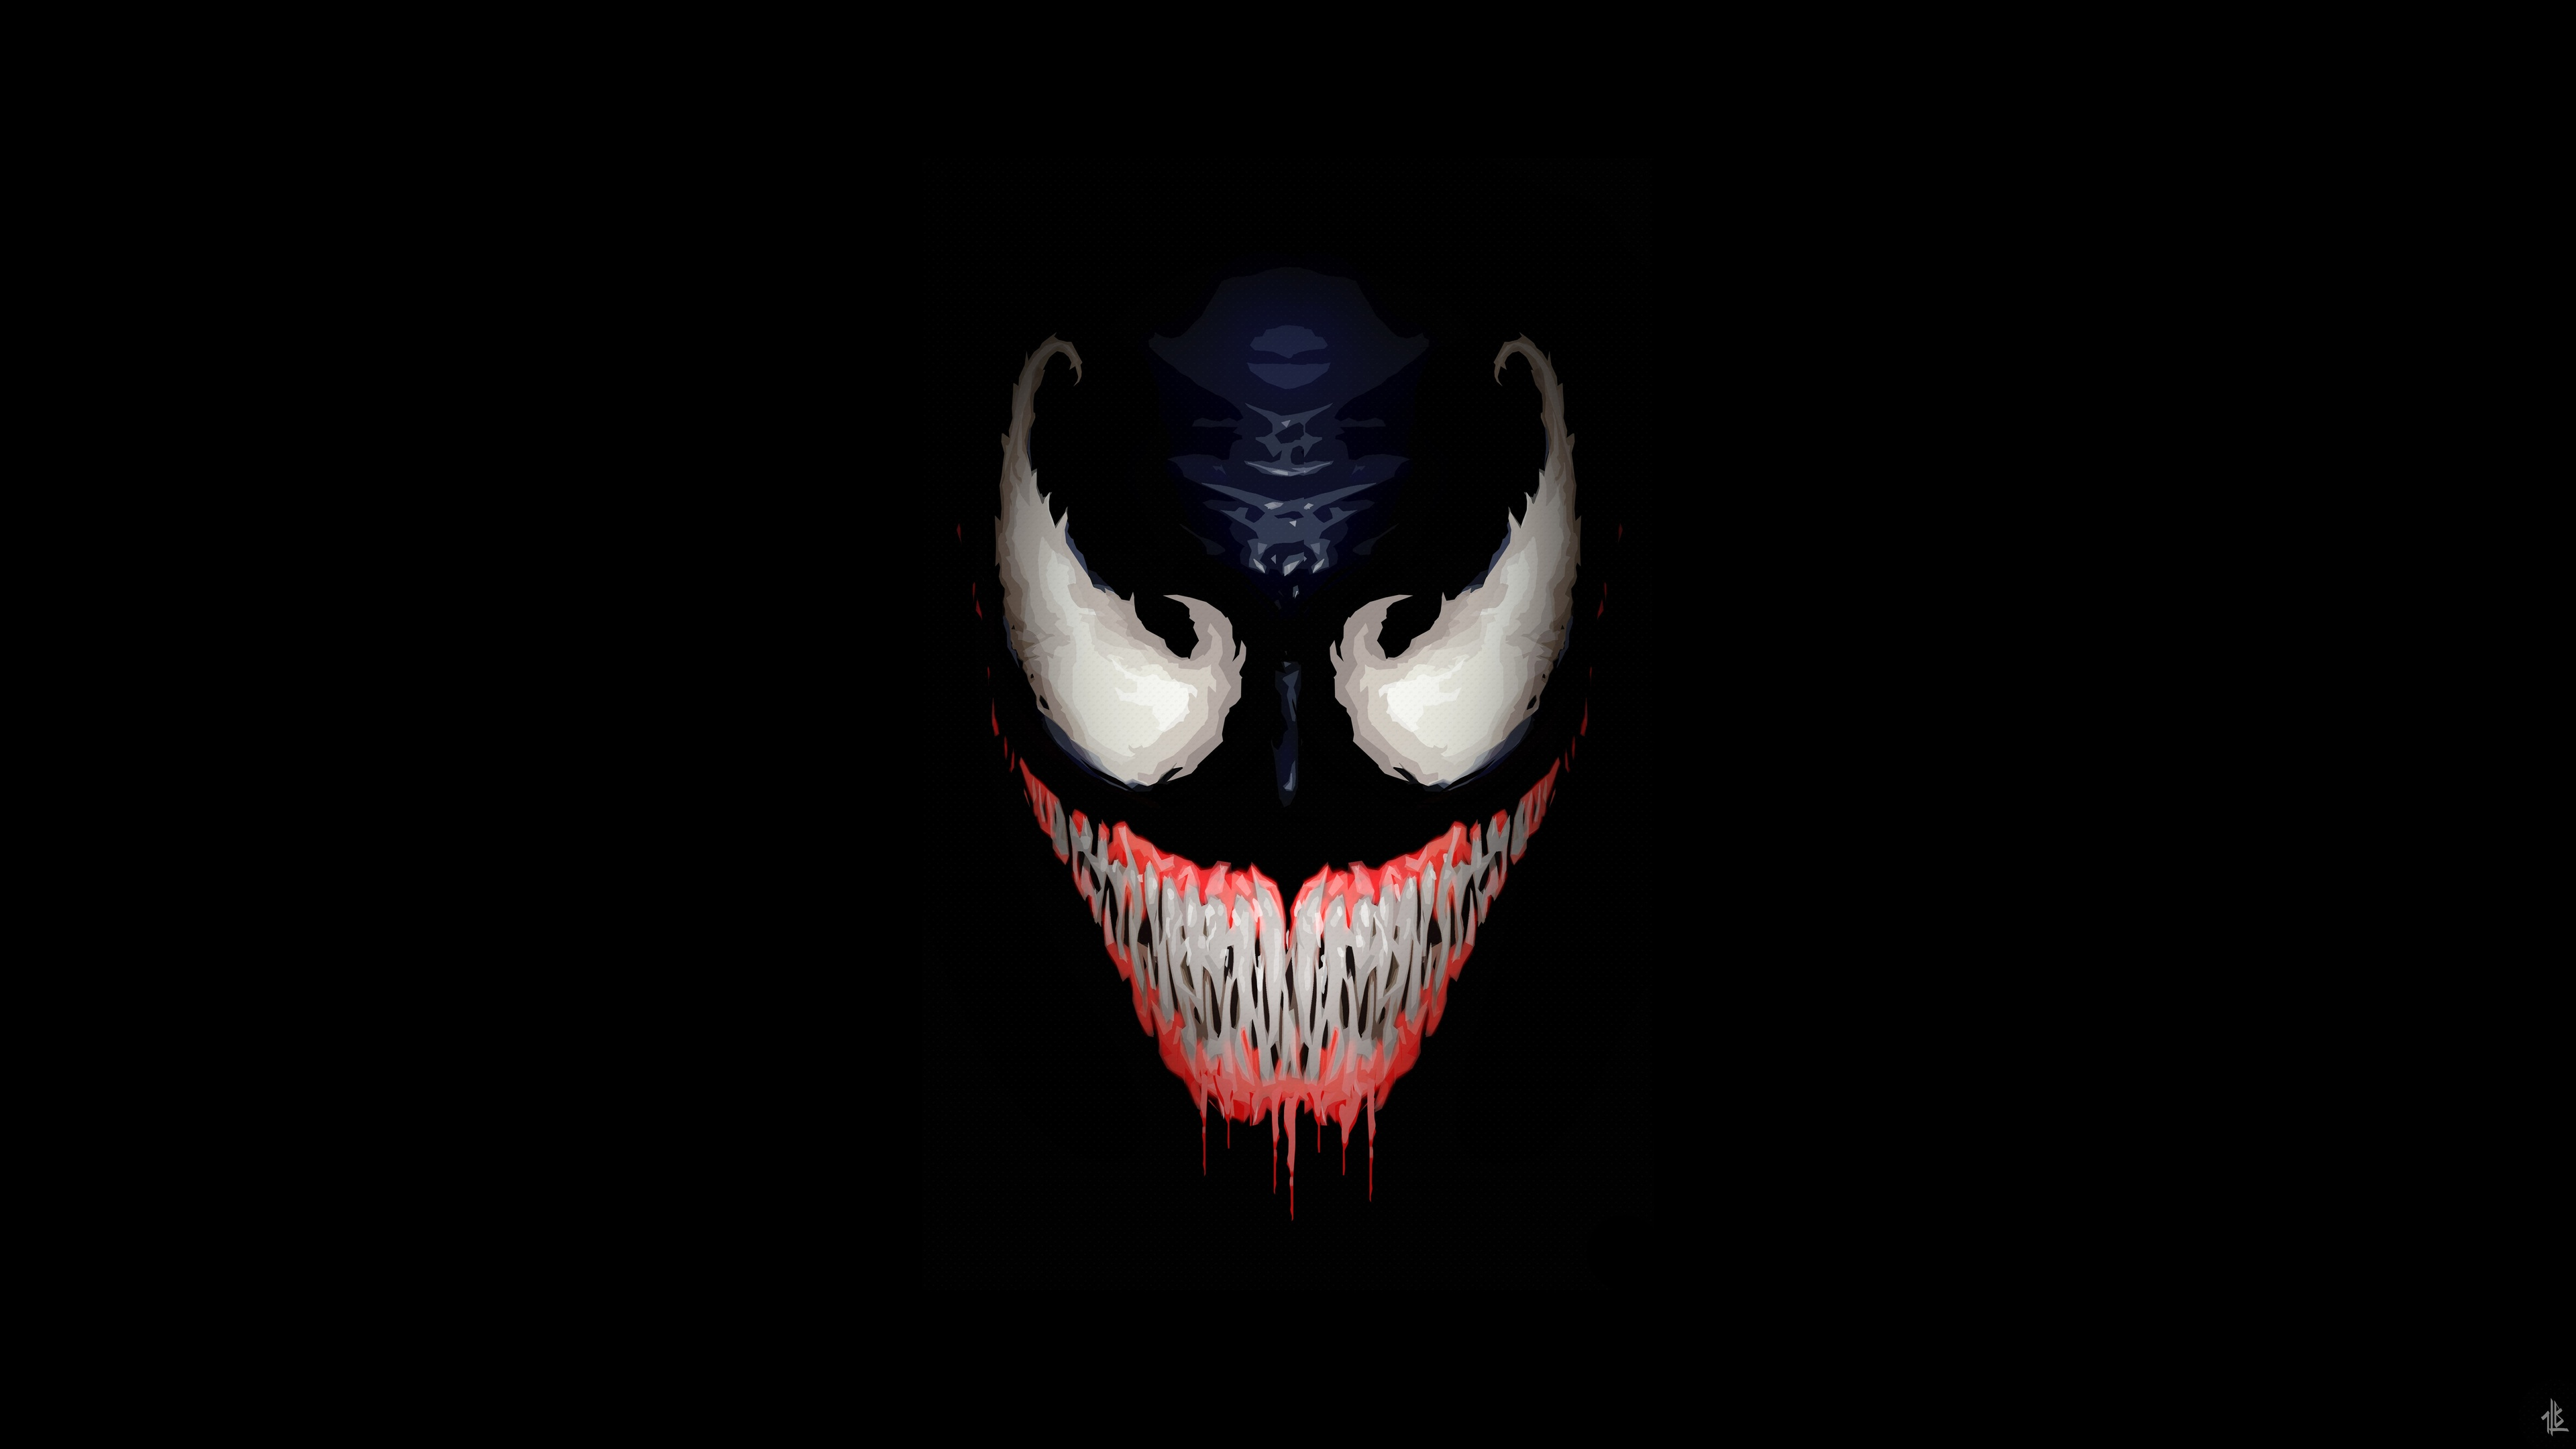 we are venom minimalism 5k 1536523739 - We Are Venom Minimalism 5k - Venom wallpapers, venom movie wallpapers, supervillain wallpapers, hd-wallpapers, digital art wallpapers, artwork wallpapers, artstation wallpapers, art wallpapers, 5k wallpapers, 4k-wallpapers